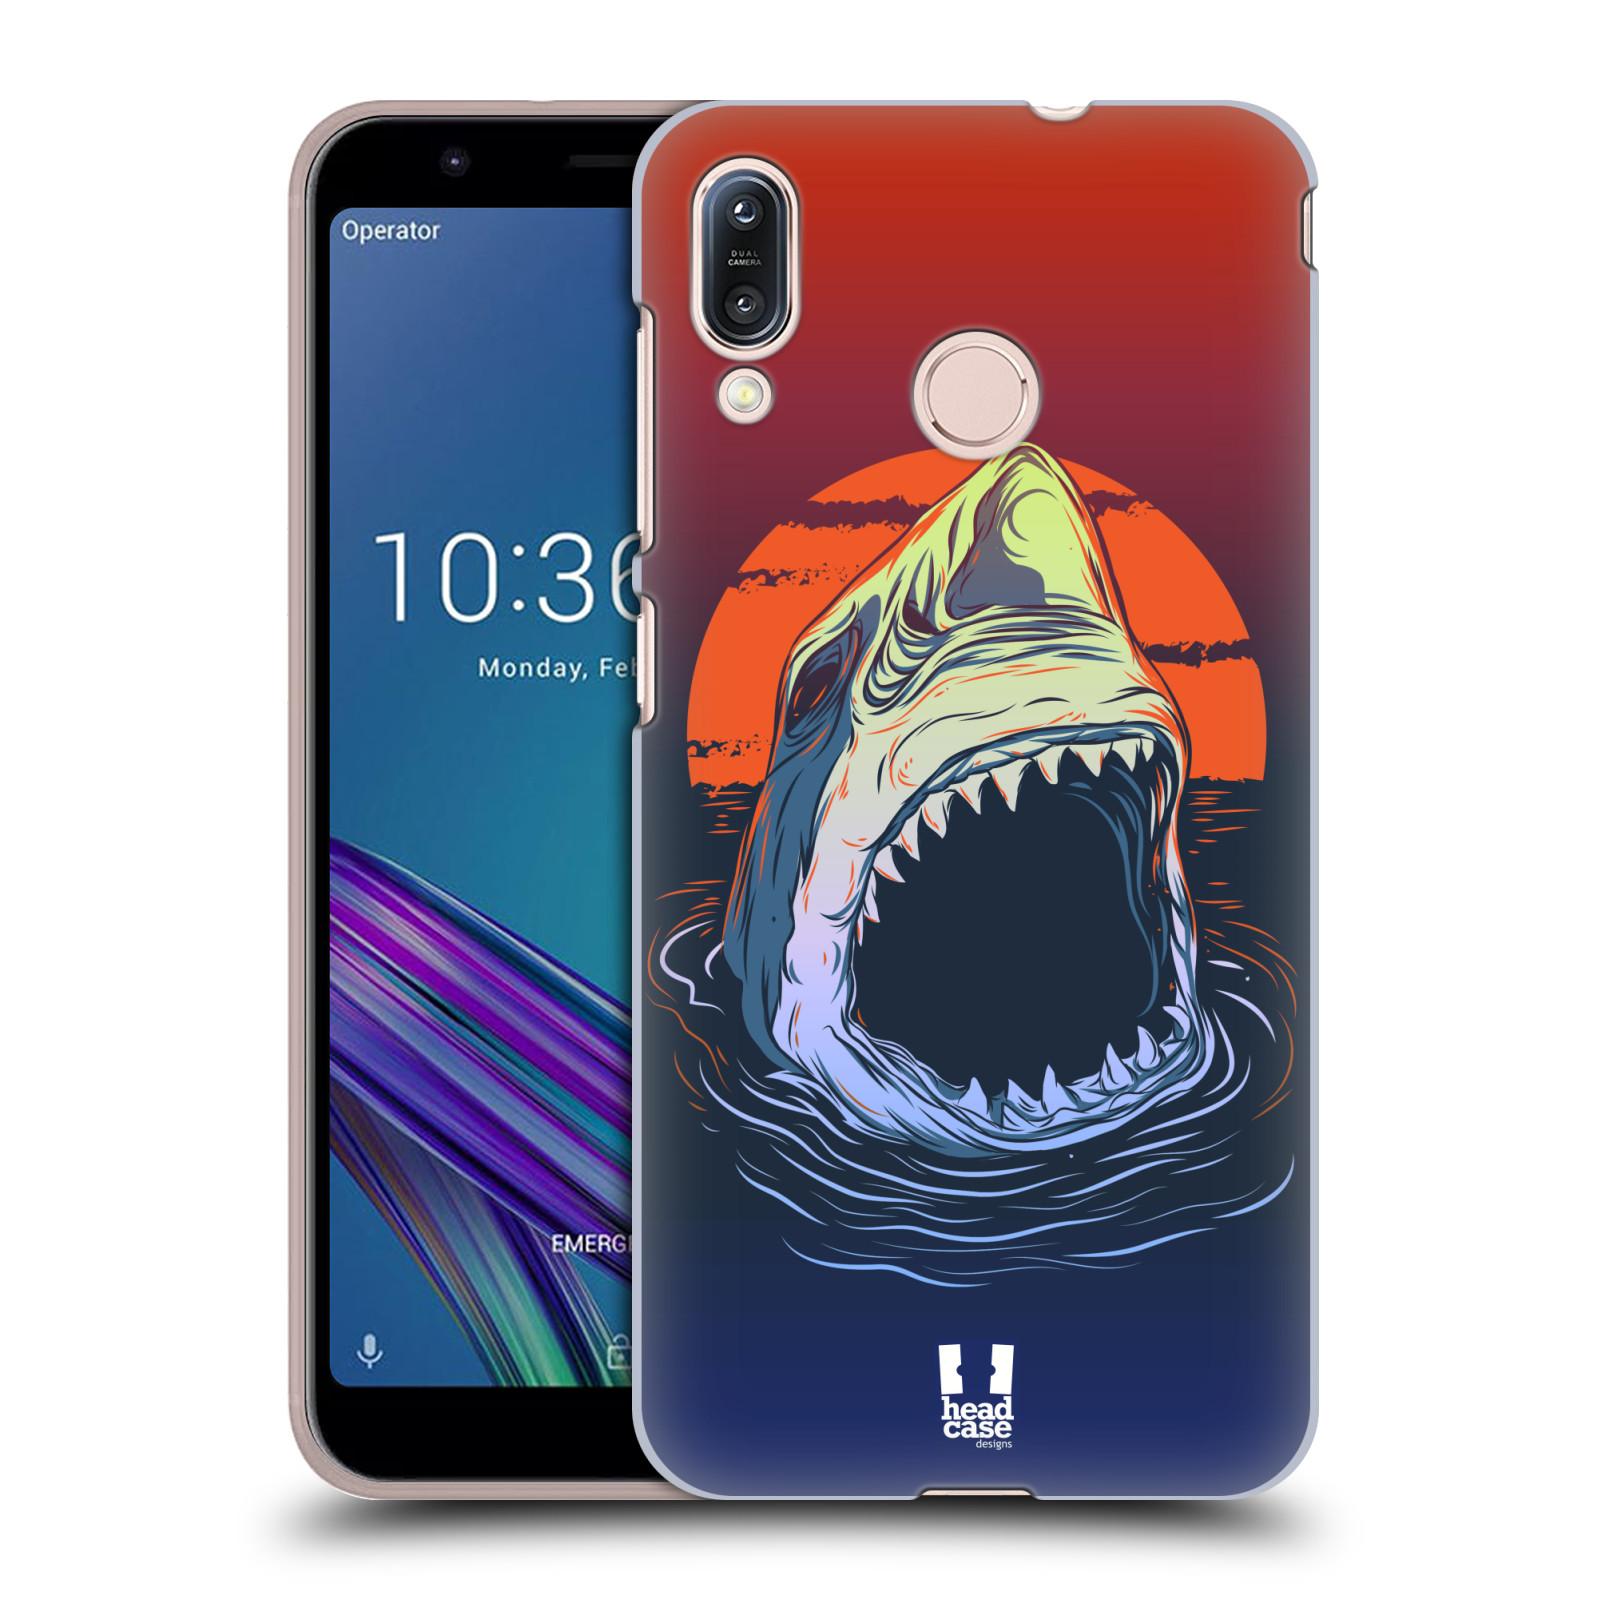 Pouzdro na mobil Asus Zenfone Max M1 (ZB555KL) - HEAD CASE - vzor mořská monstra žralok